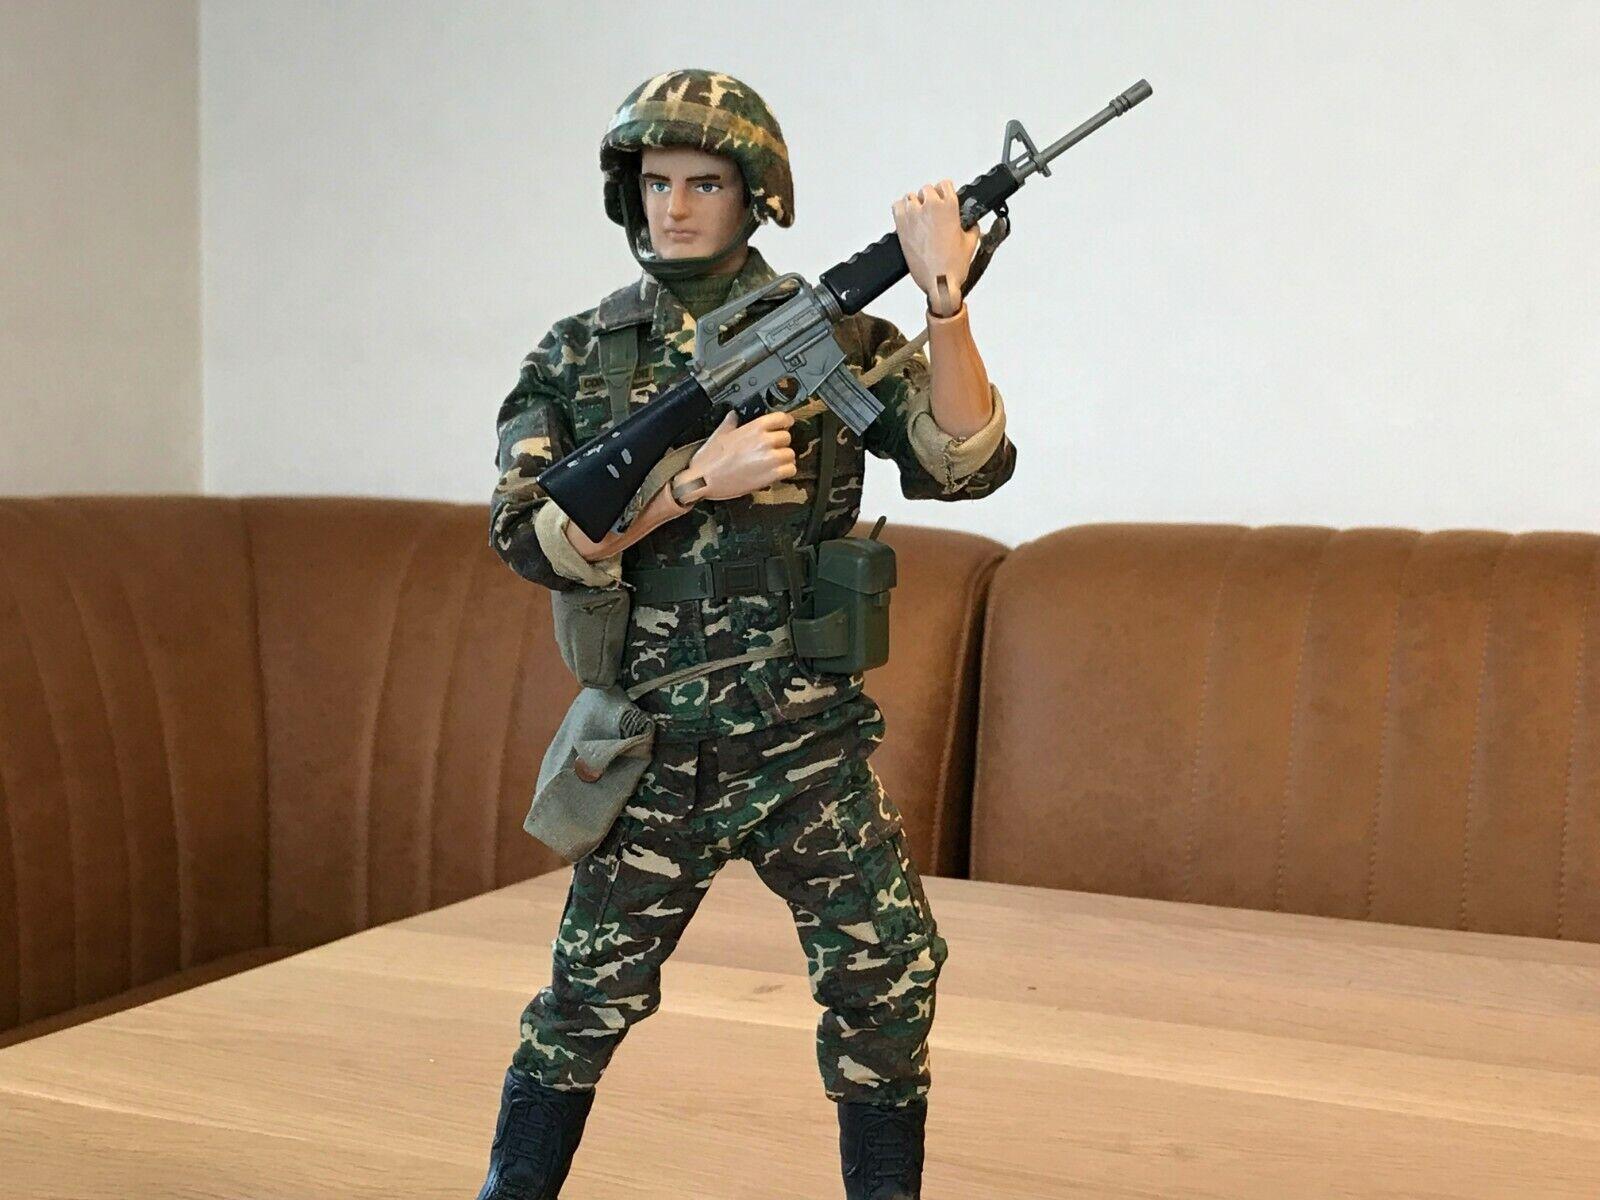 Rare TAKARA COMBAT JOE 1 6 Military Action Figure Army Soldier Made in Japan